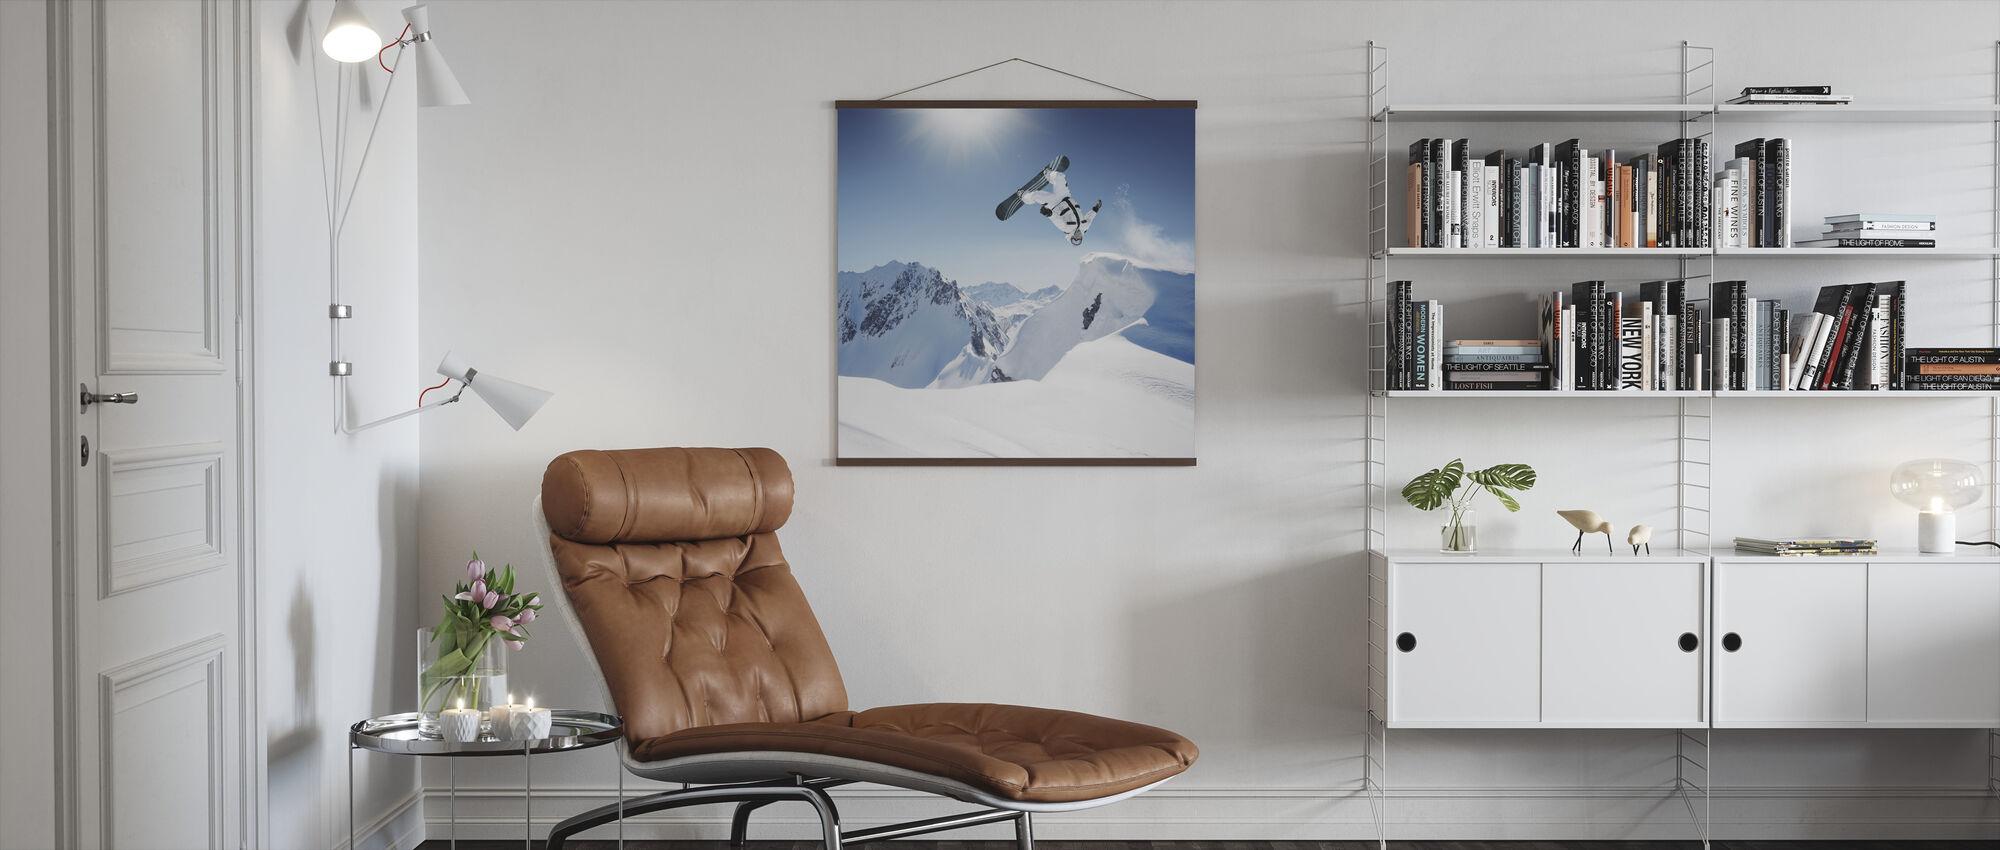 Snowboarder Backflip - Poster - Living Room